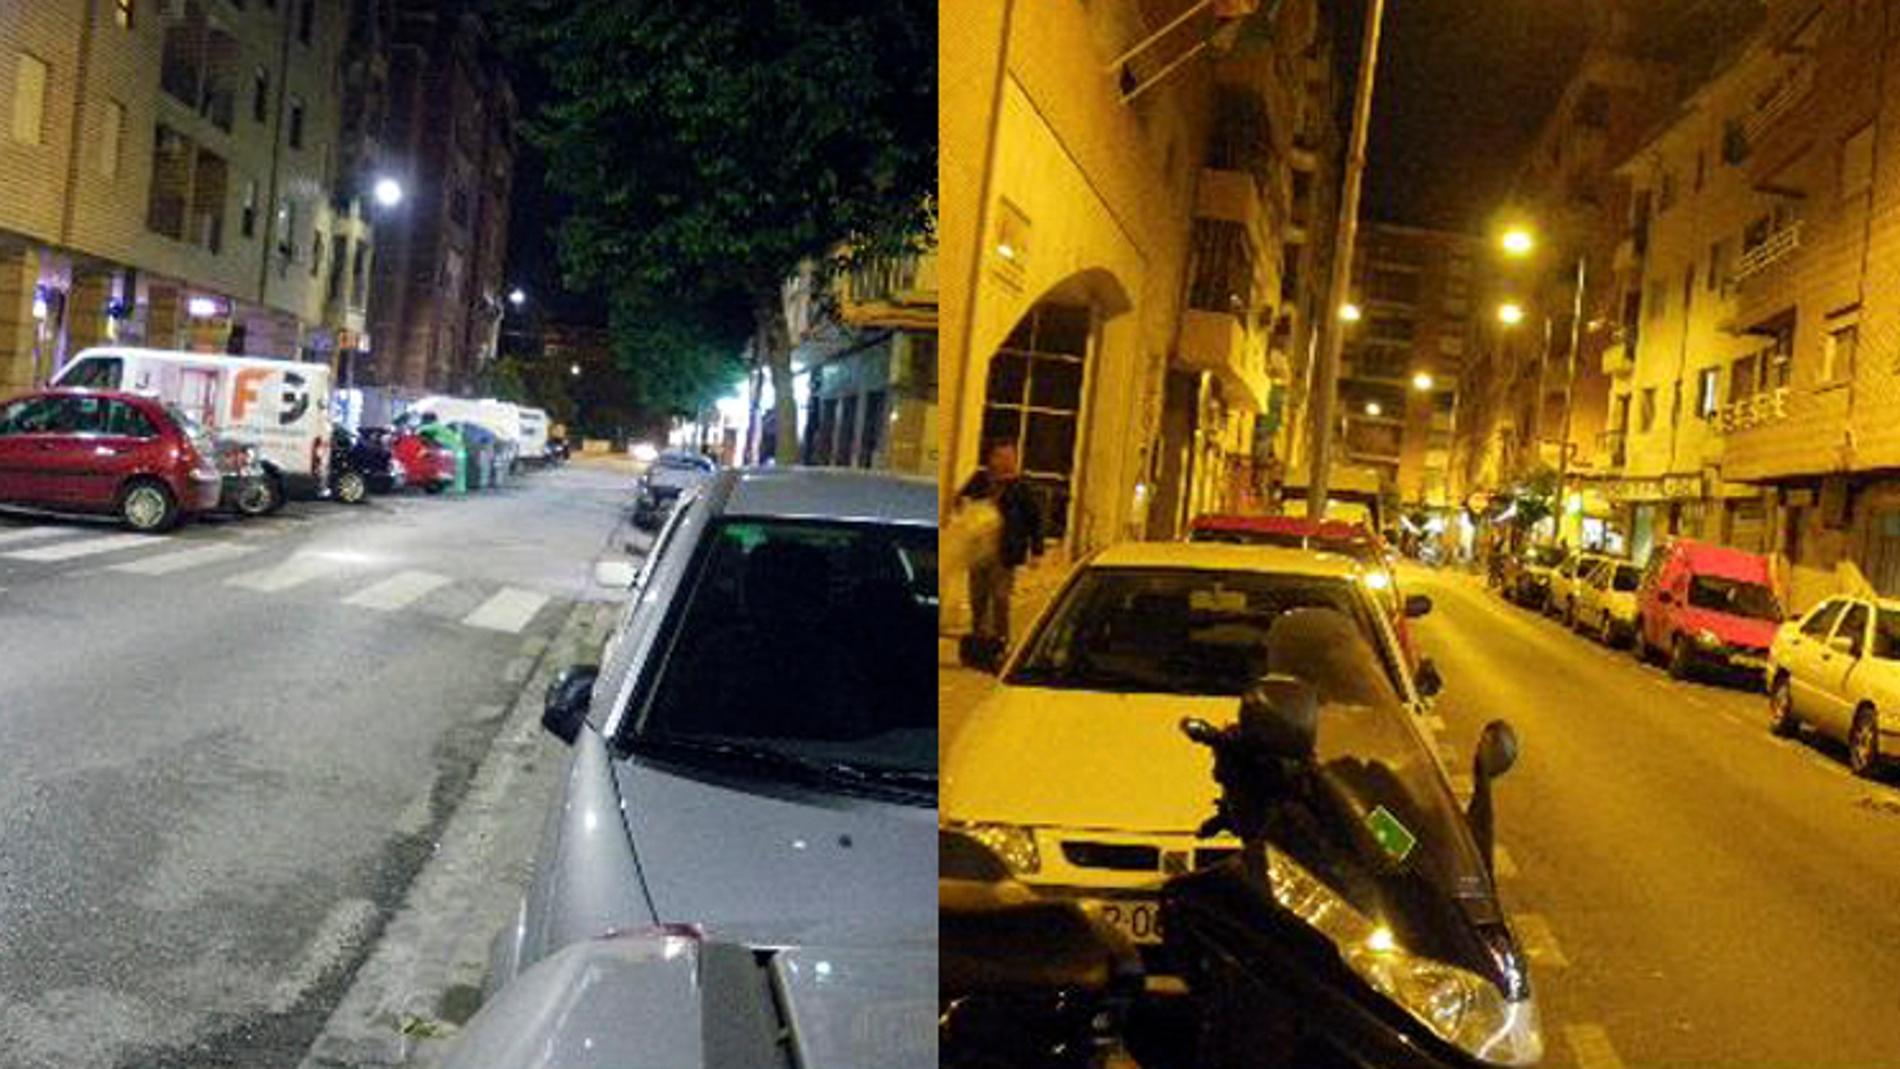 Una calle iluminada con luz blanca (lumi